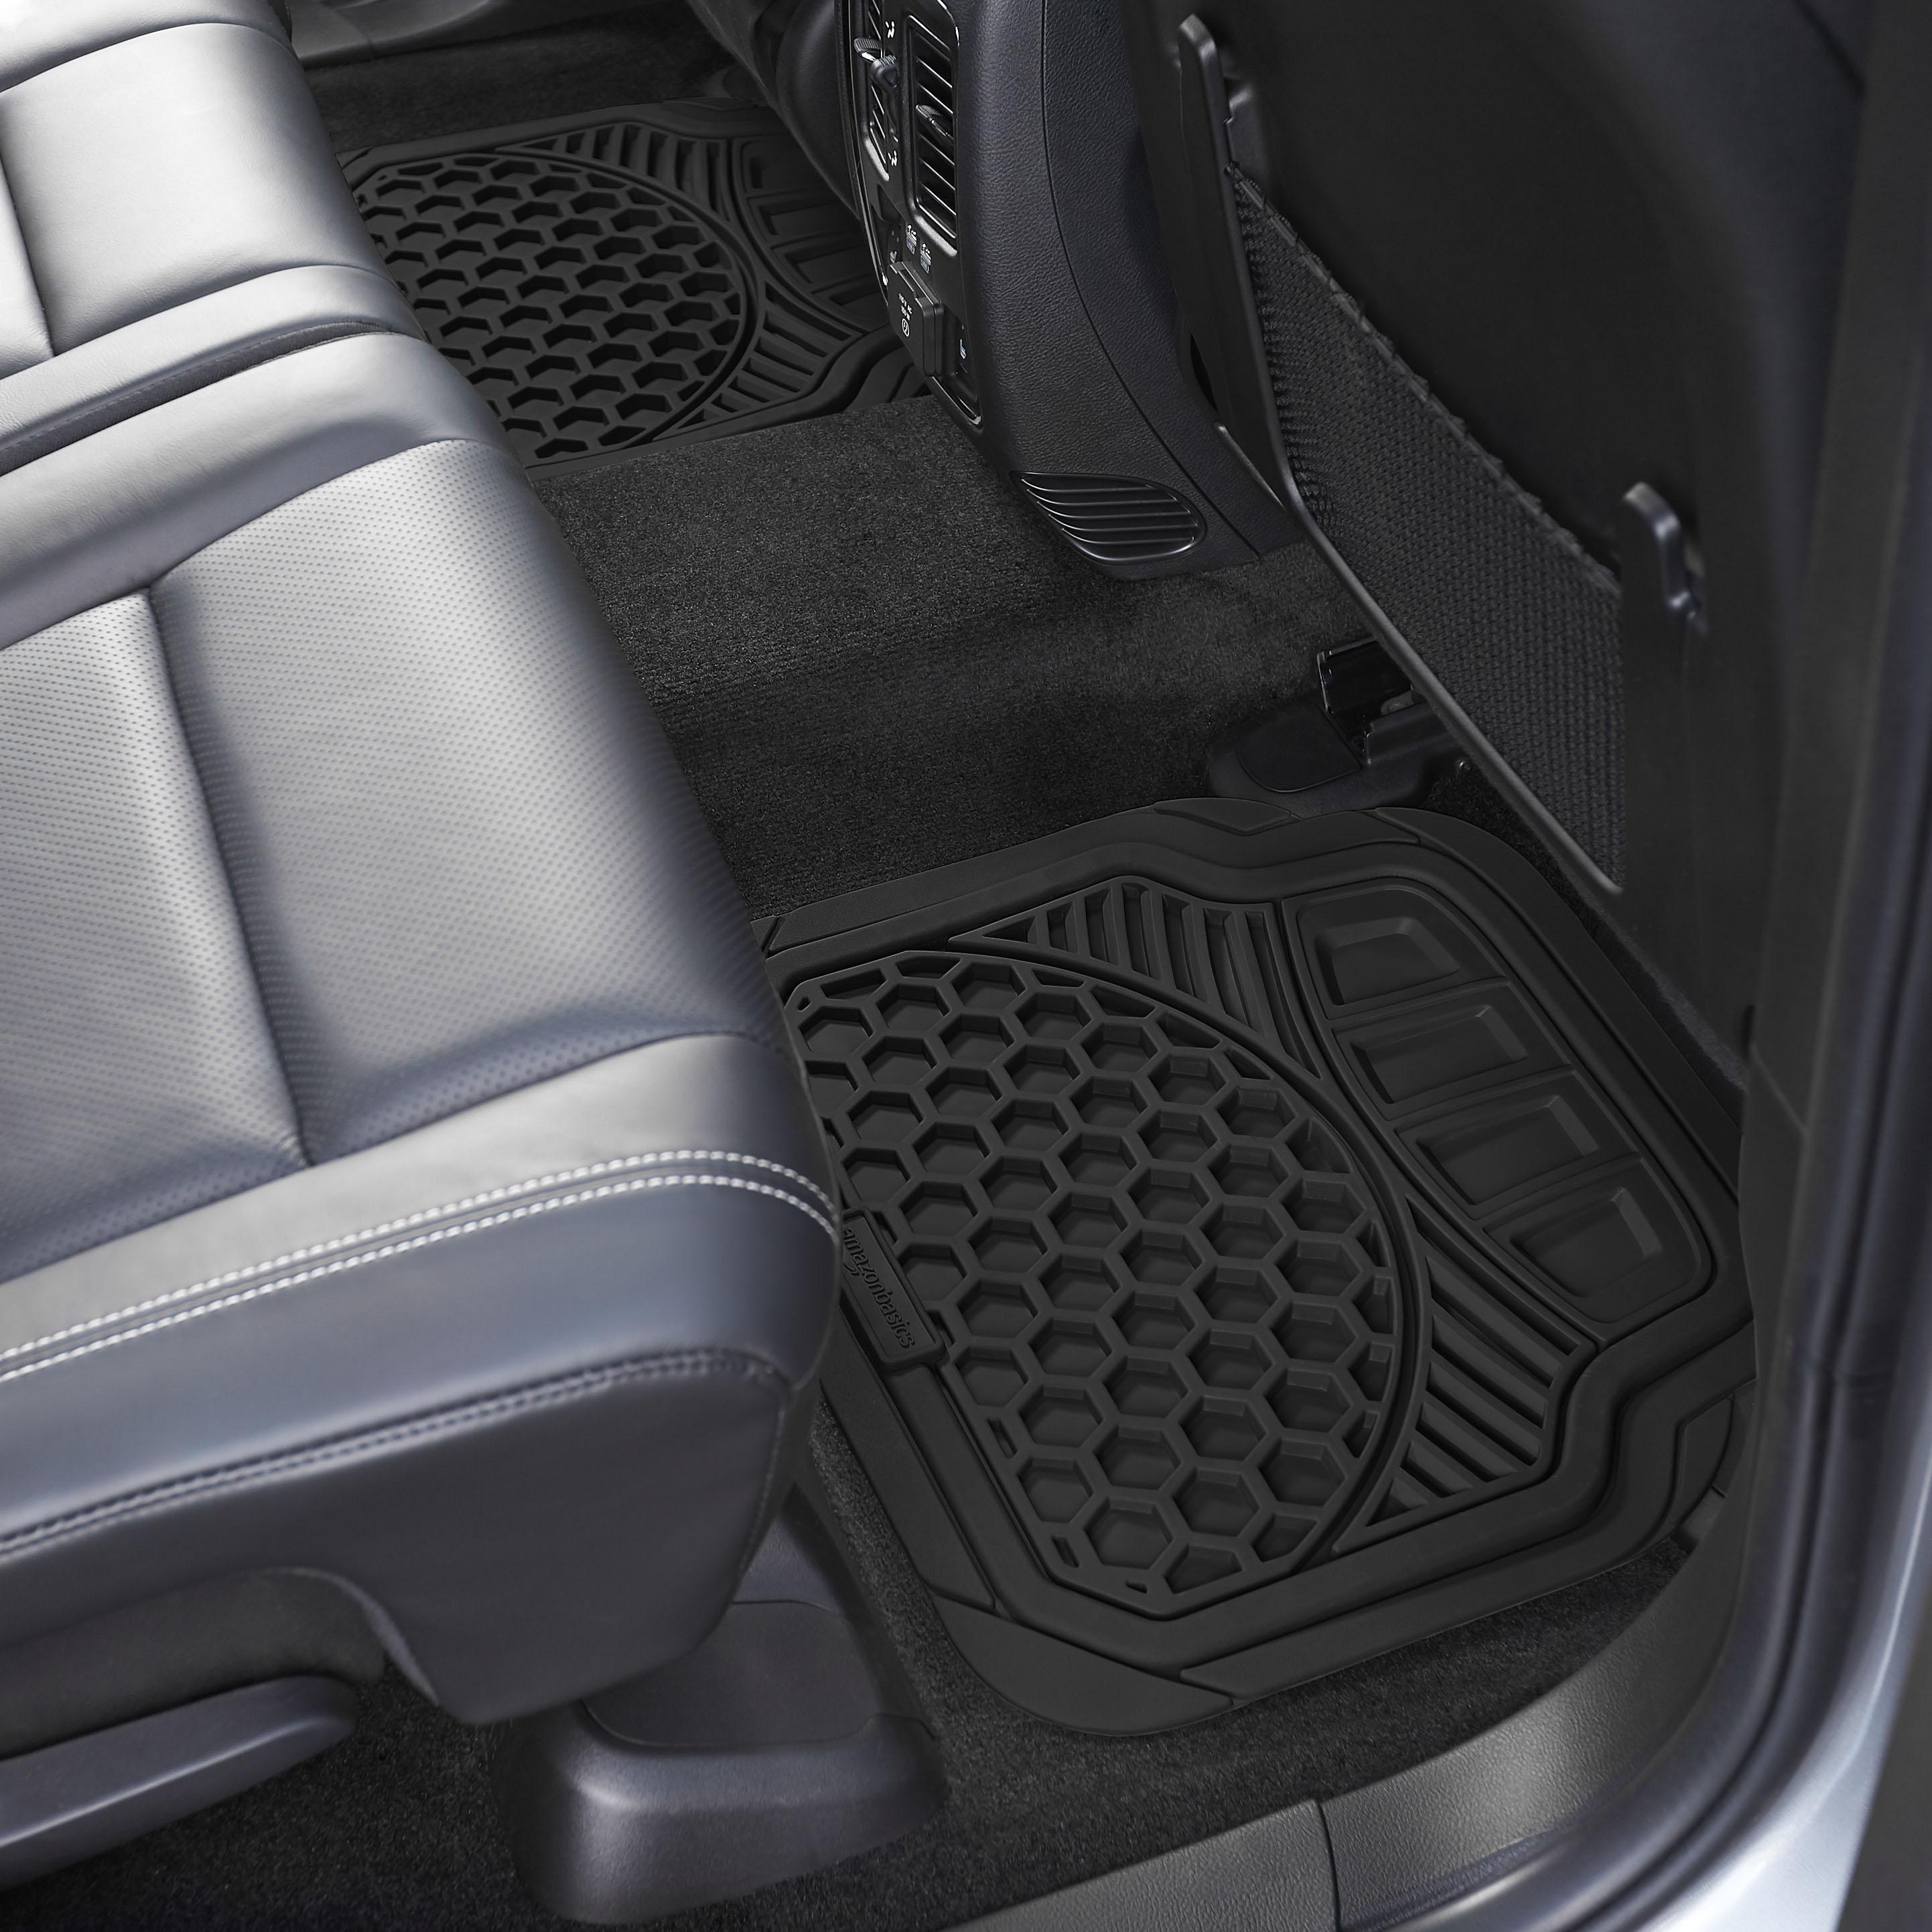 Amazon.com: AmazonBasics 4 Piece Heavy Duty Car Floor Mat